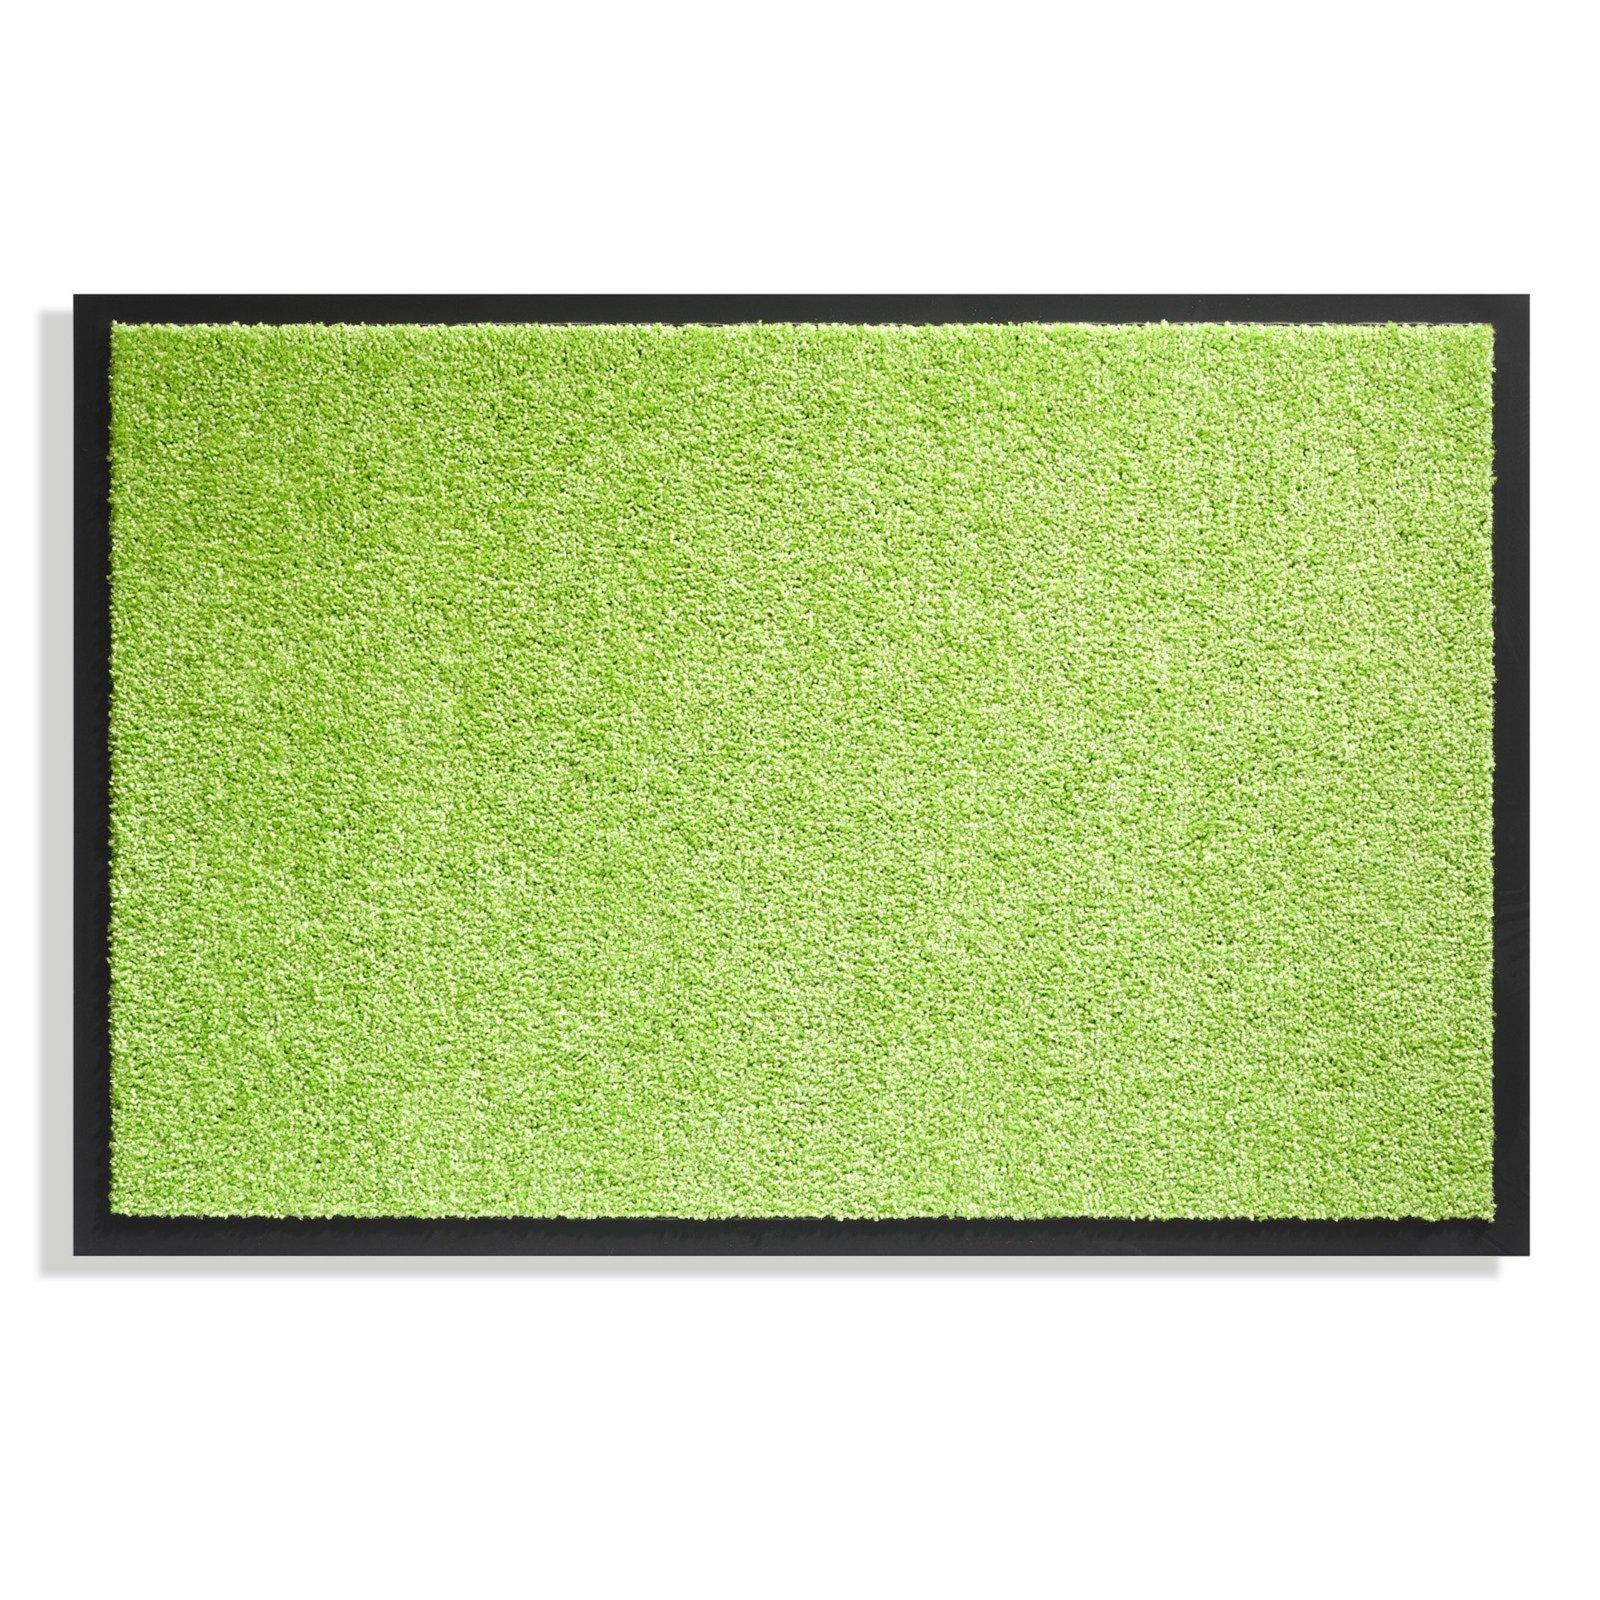 Fußmatte TWISTER - lime - 90x60 cm